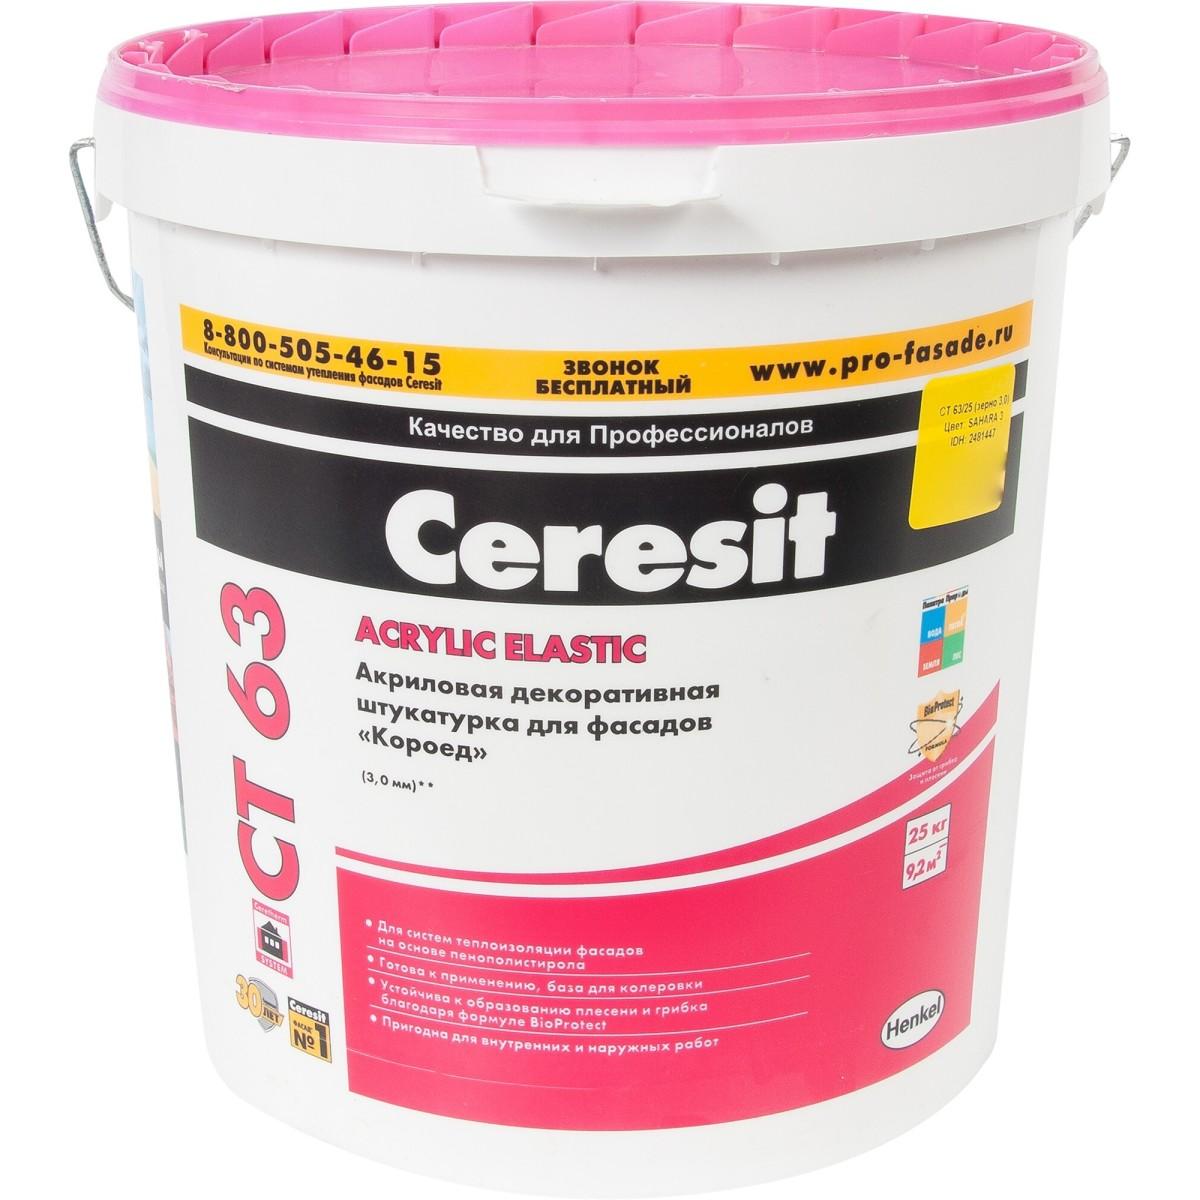 Штукатурка декоративная Ceresit CT63 Andalusia 2 короед 3.0 мм 25 кг